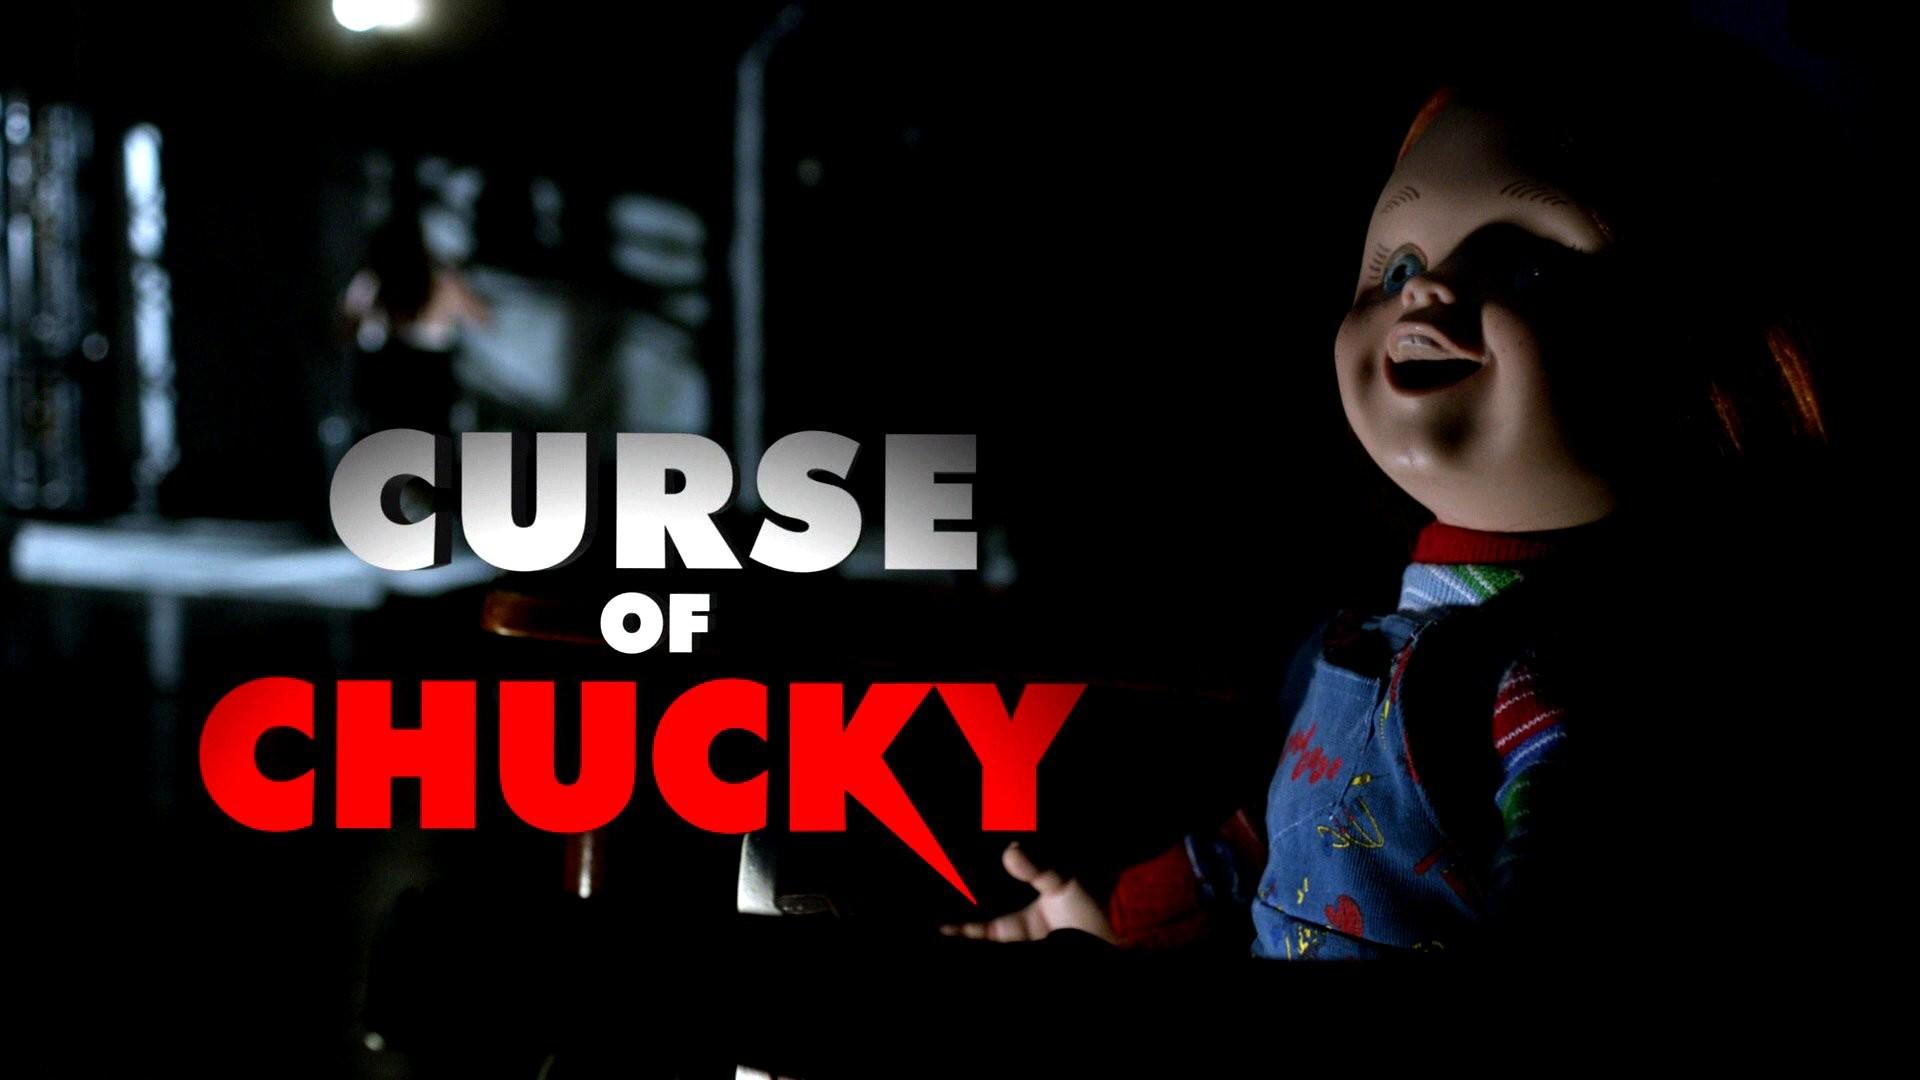 CHILDS PLAY chucky dark horror creepy scary (19) wallpaper | |  235521 | WallpaperUP